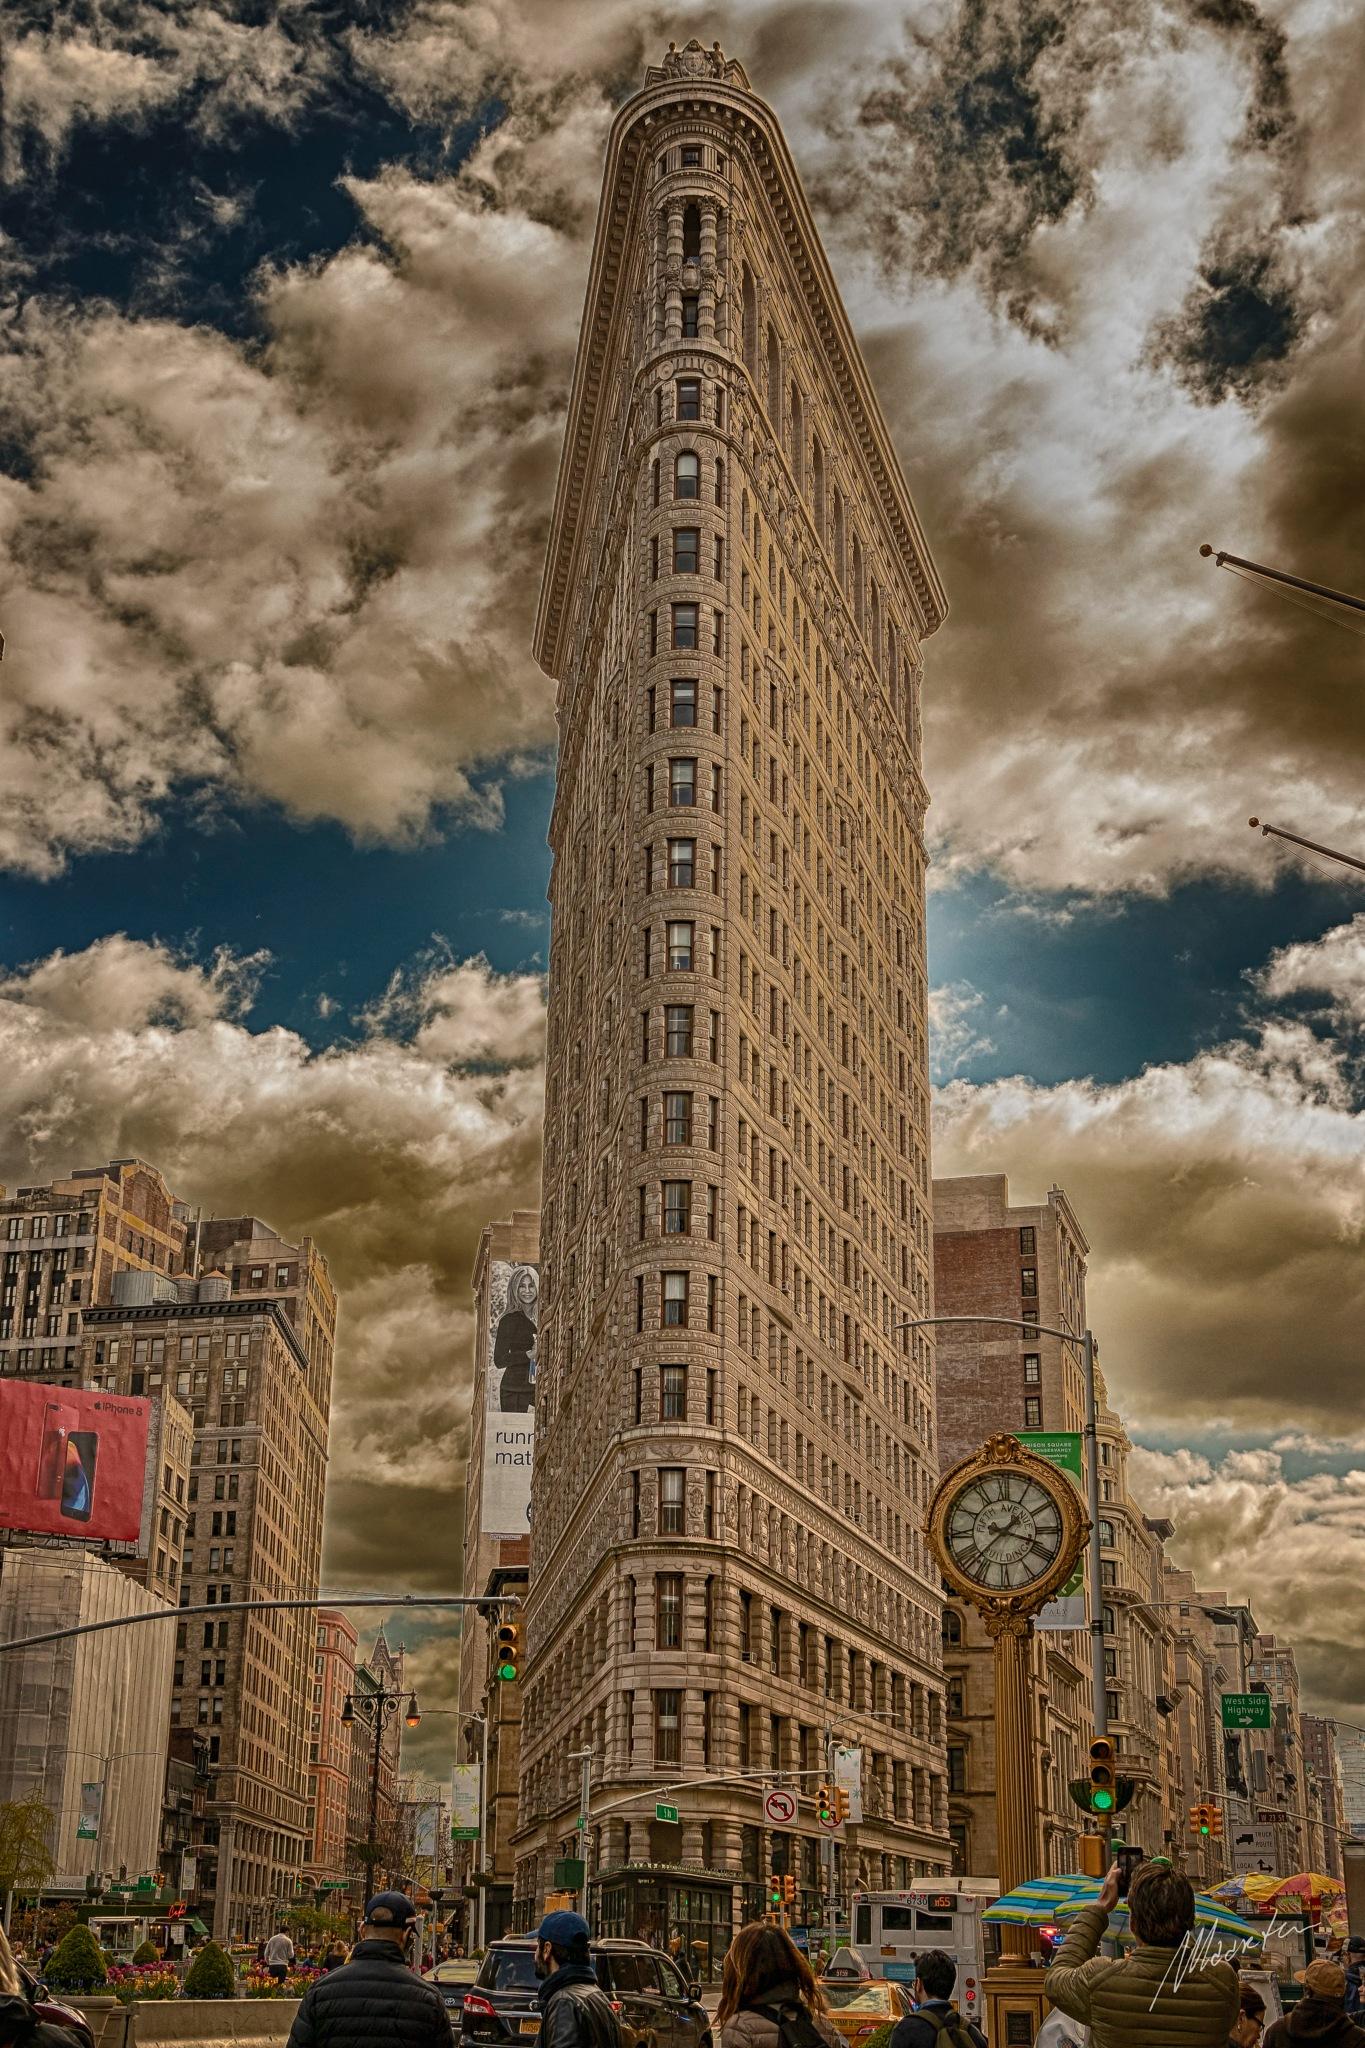 Flatiron Building New York... HDR over the top? by Maarten Hendriks